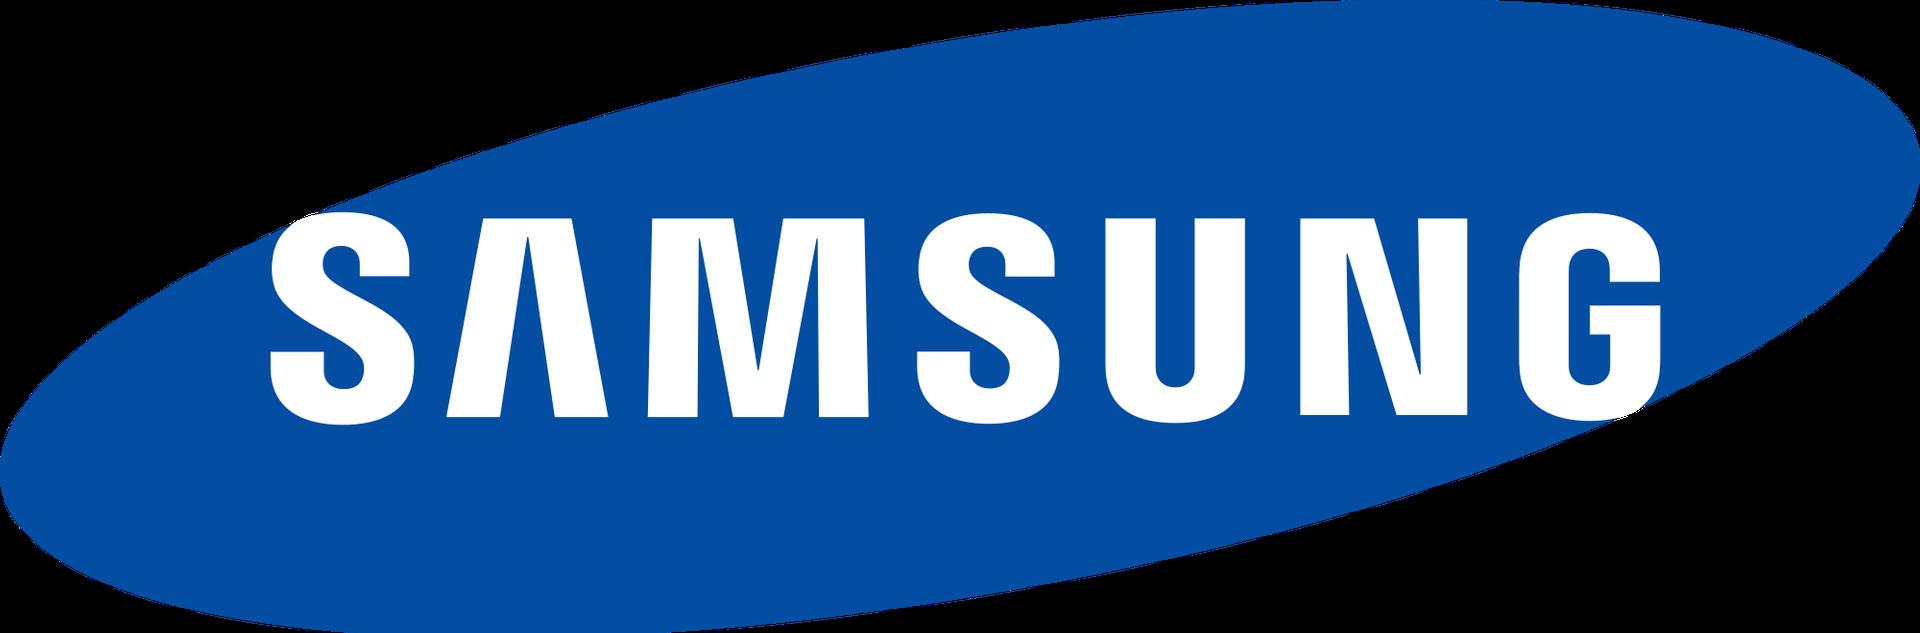 Samsung Free Manuals - Free Manuals